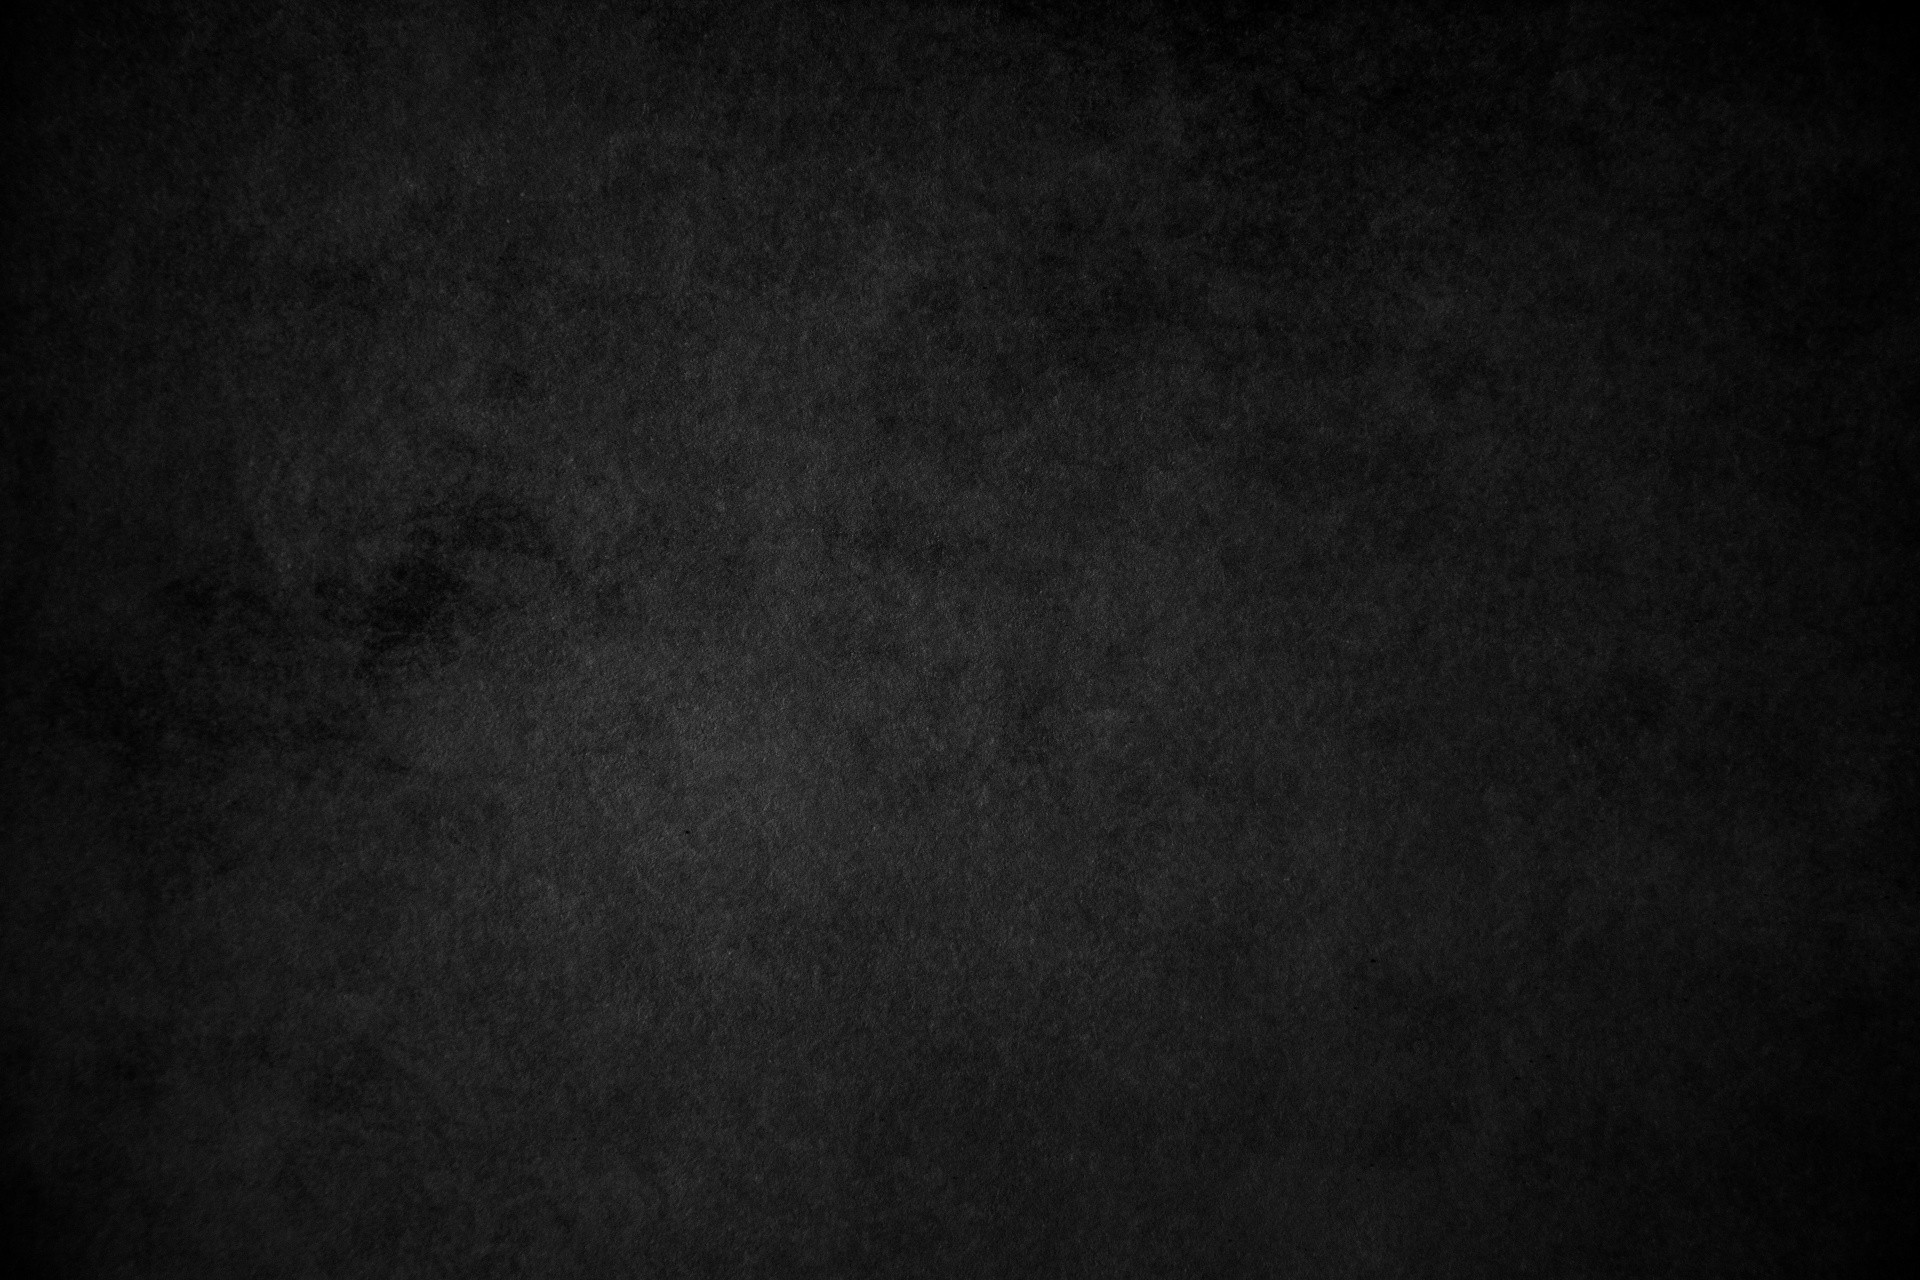 Dark Grunge Background Tumblr Grunge background Tumb...